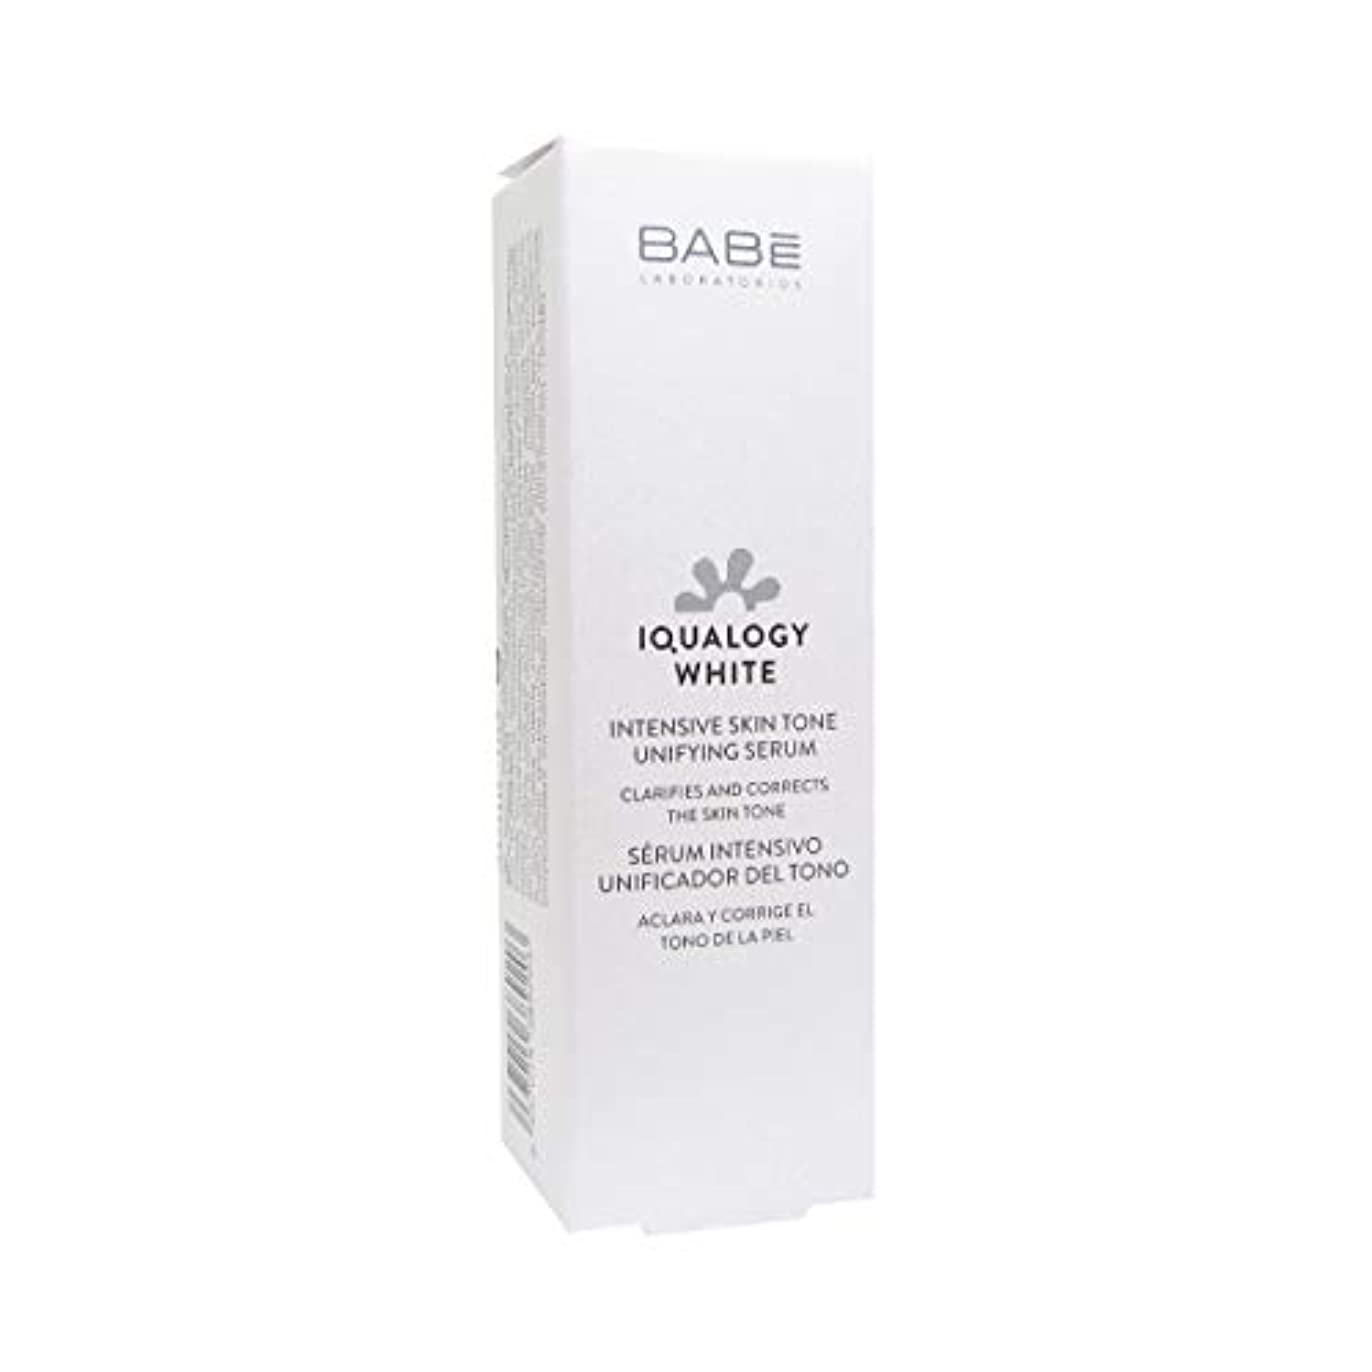 年齢宇宙飛行士炎上Bab Iqualogy White Unifying Serum 50ml [並行輸入品]